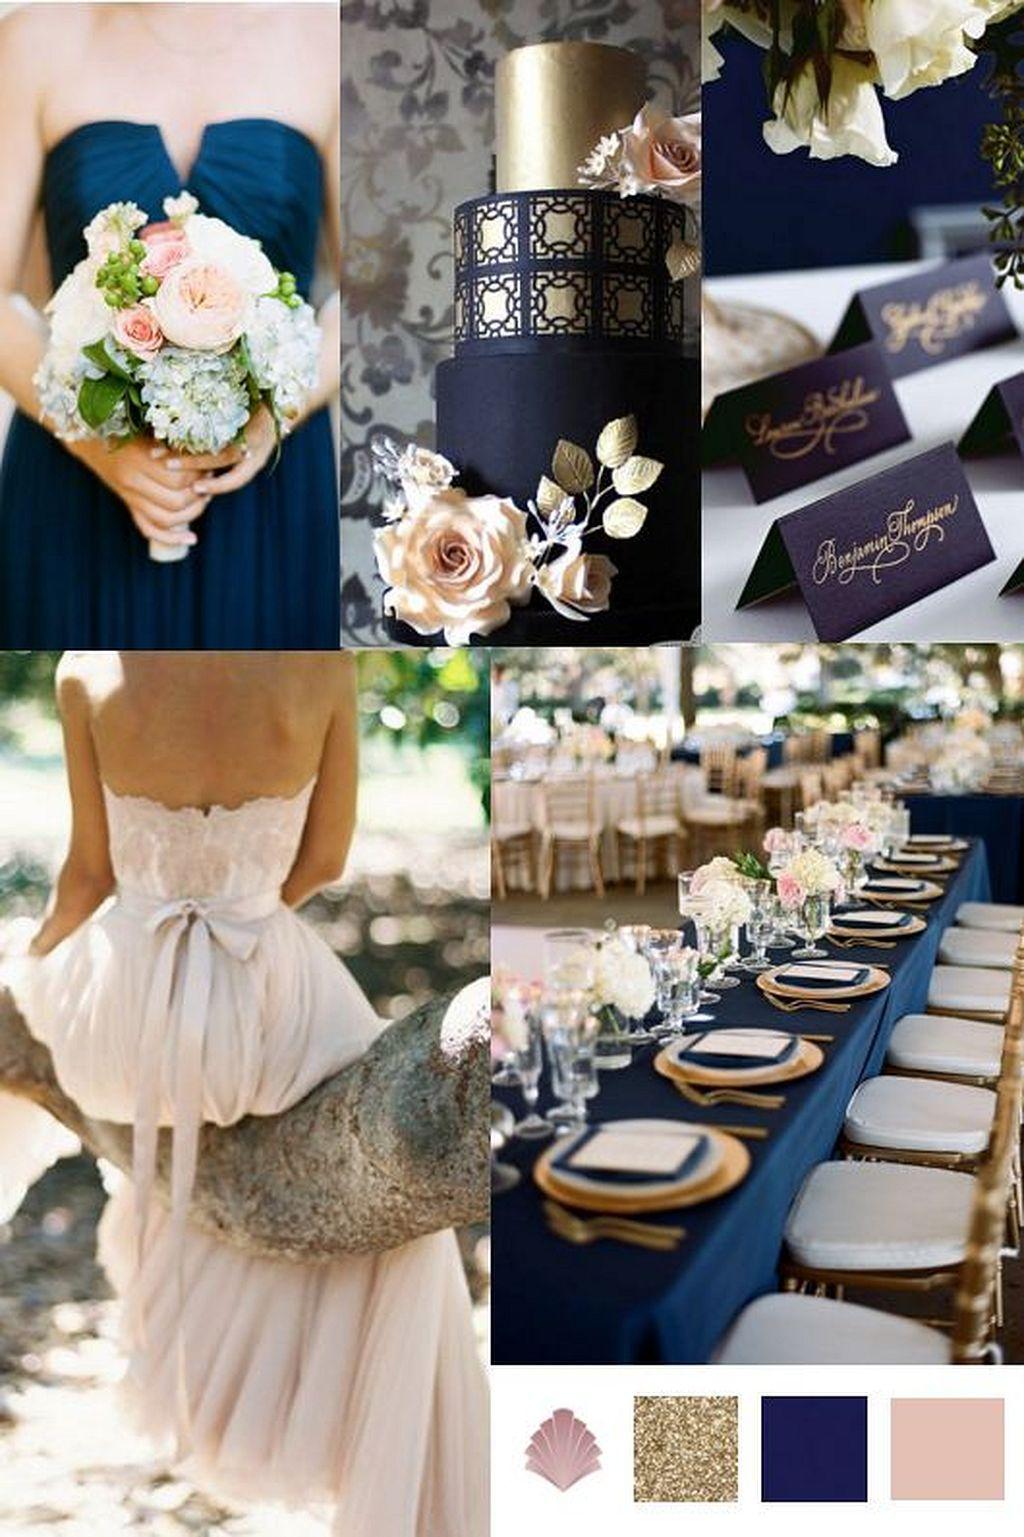 108 Navy Blue Wedding Theme Ideas Navy Blue Wedding Theme Blue